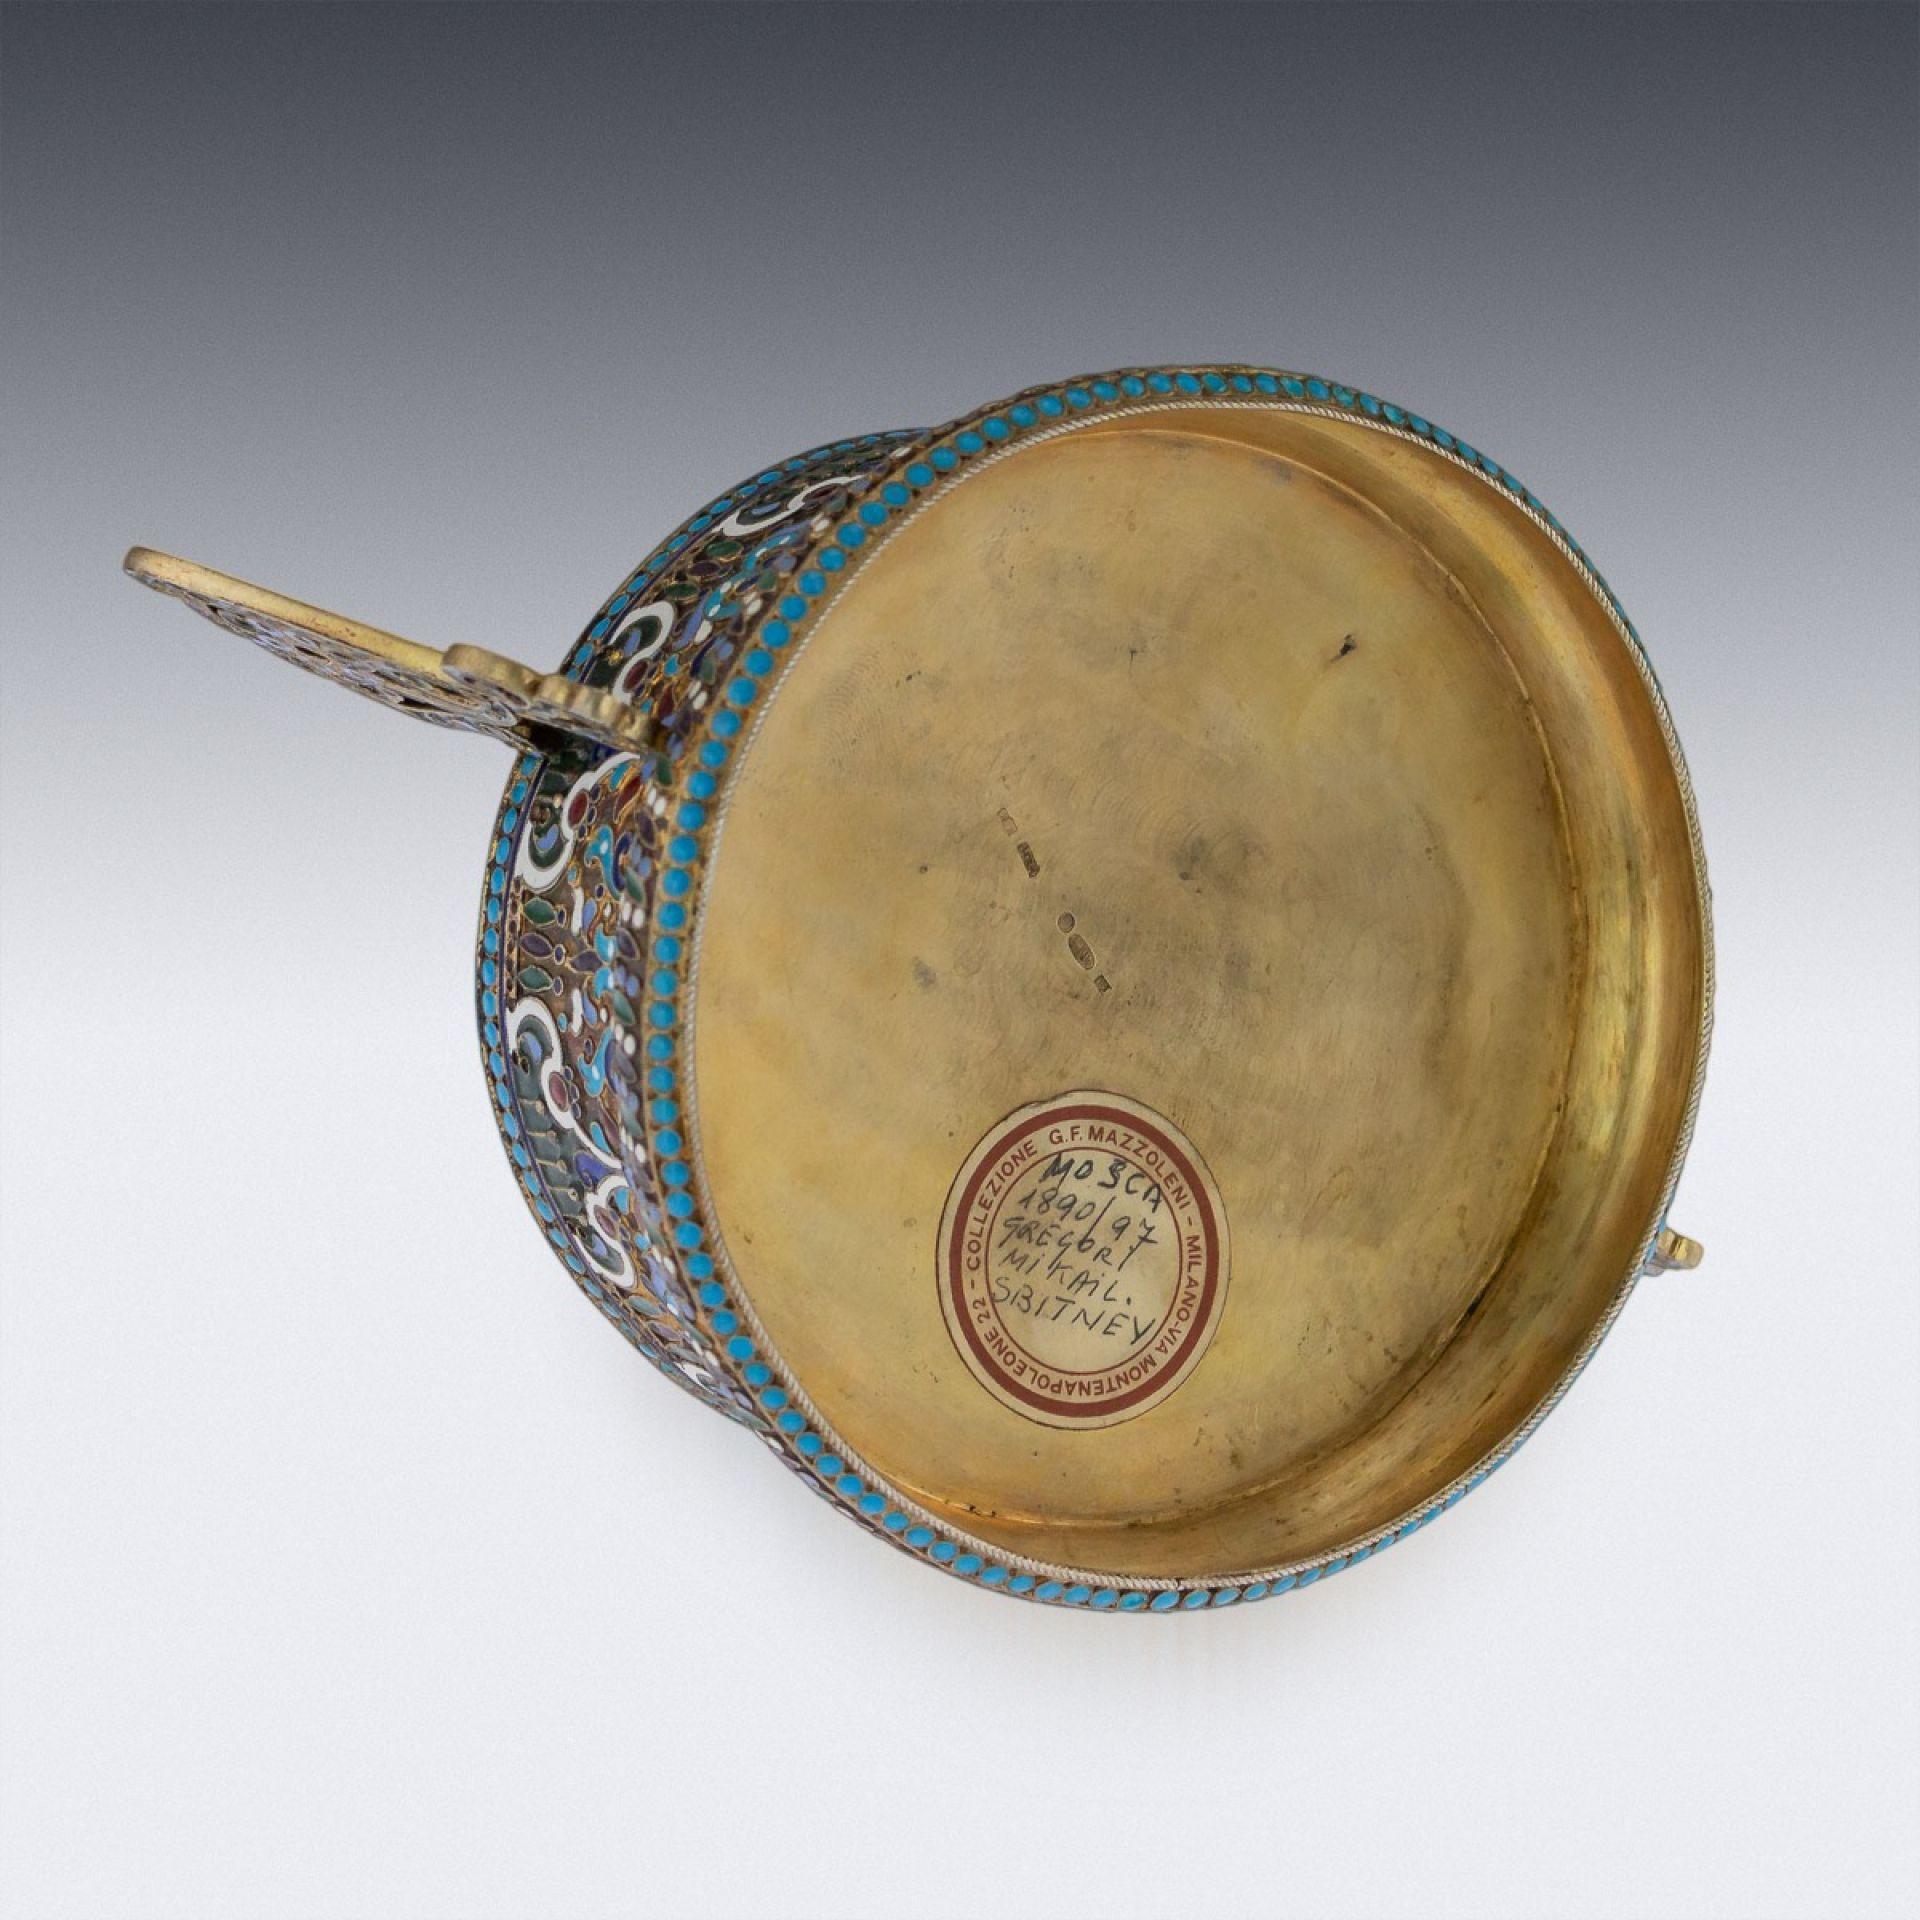 ANTIQUE 20thC IMPERIAL RUSSIAN SOLID SILVER & ENAMEL SUGAR BOWL & TONGS c.1910